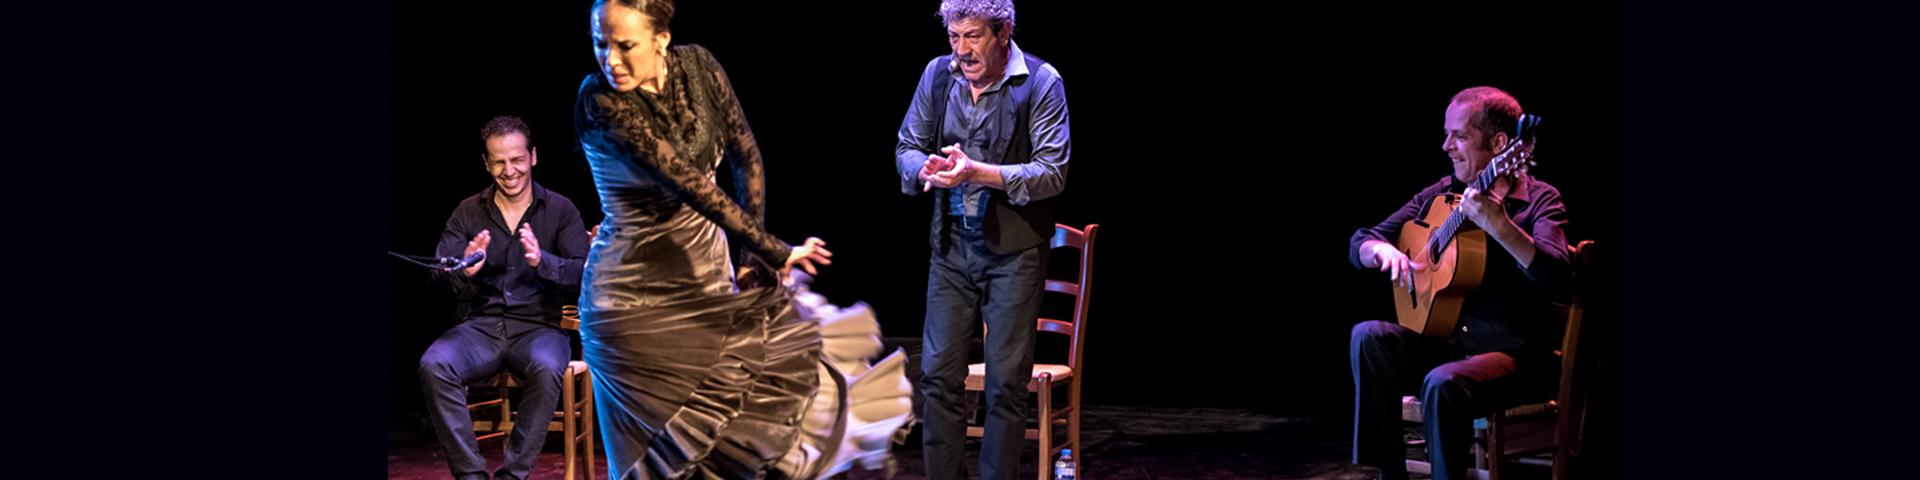 Flamenco por un poeta